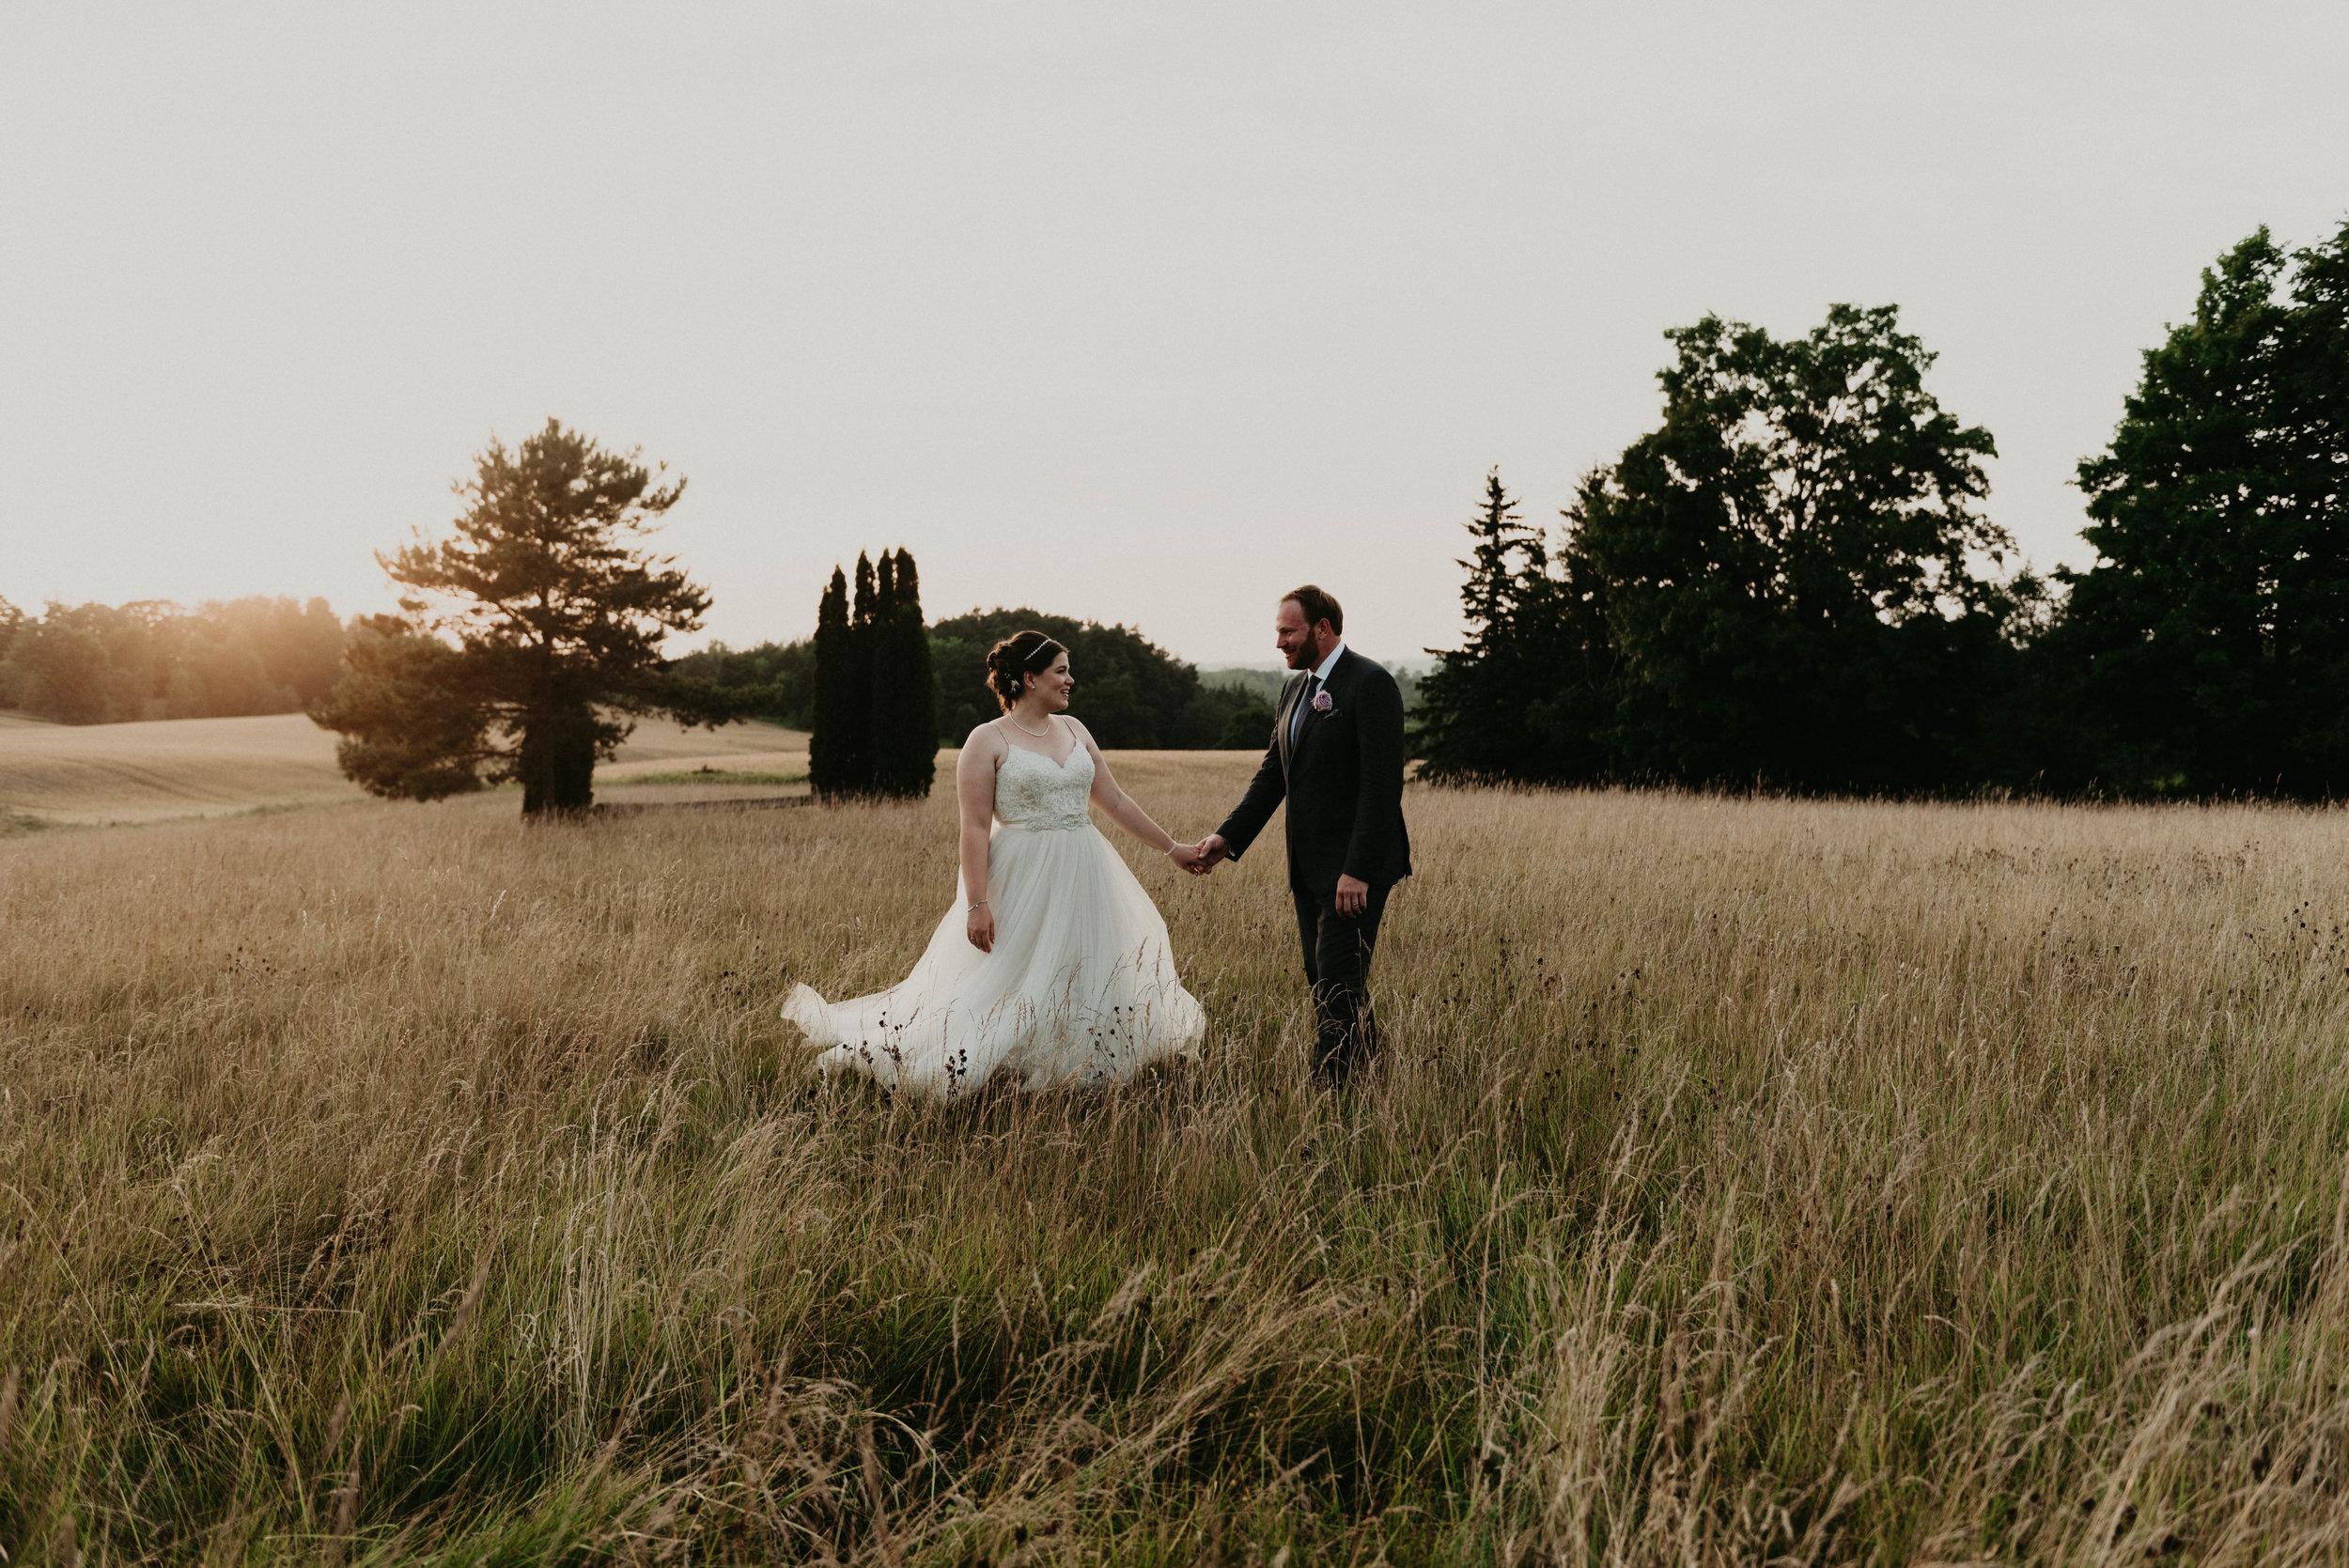 Couples wedding portraits at golden hour